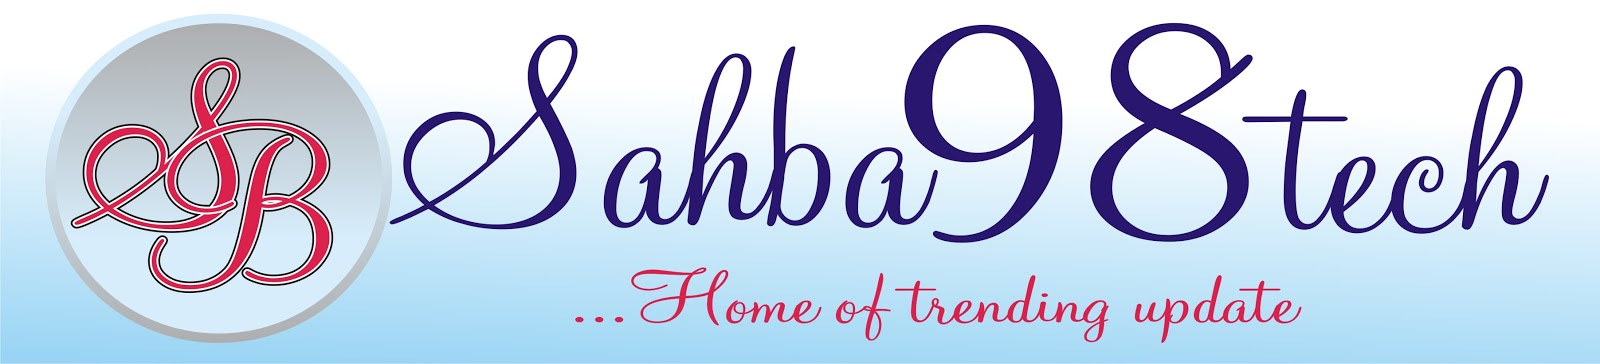 Sahba98tech